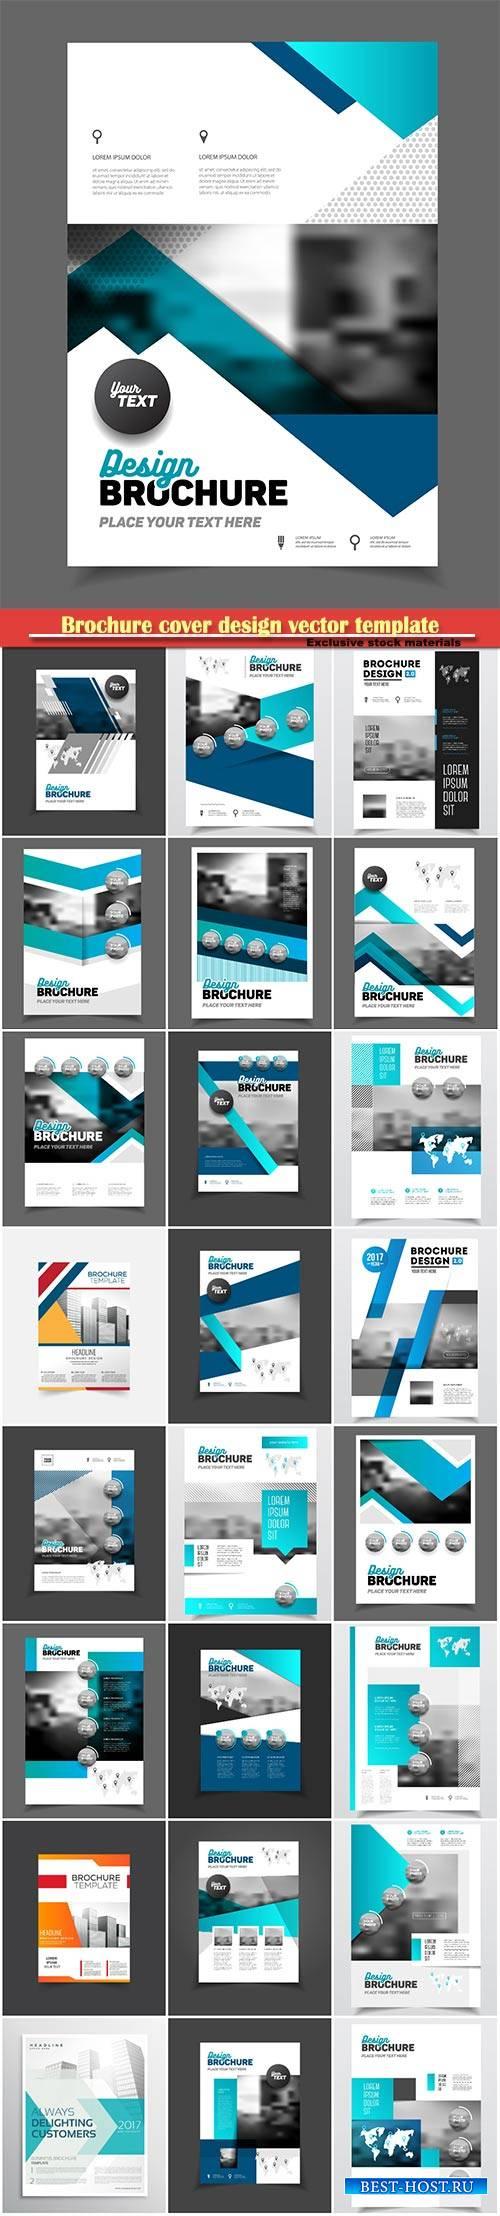 Brochure cover design vector template # 16